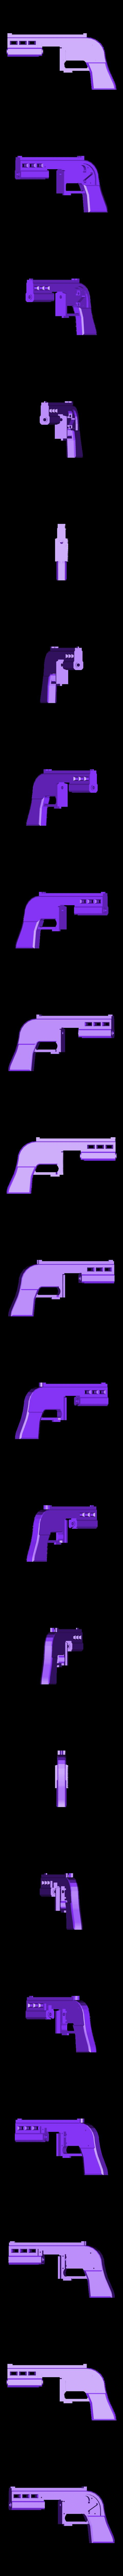 Flame  4inch.stl Download STL file Pack 2 Magnum cal.38 and 22 short and long • 3D print design, Kraken1983